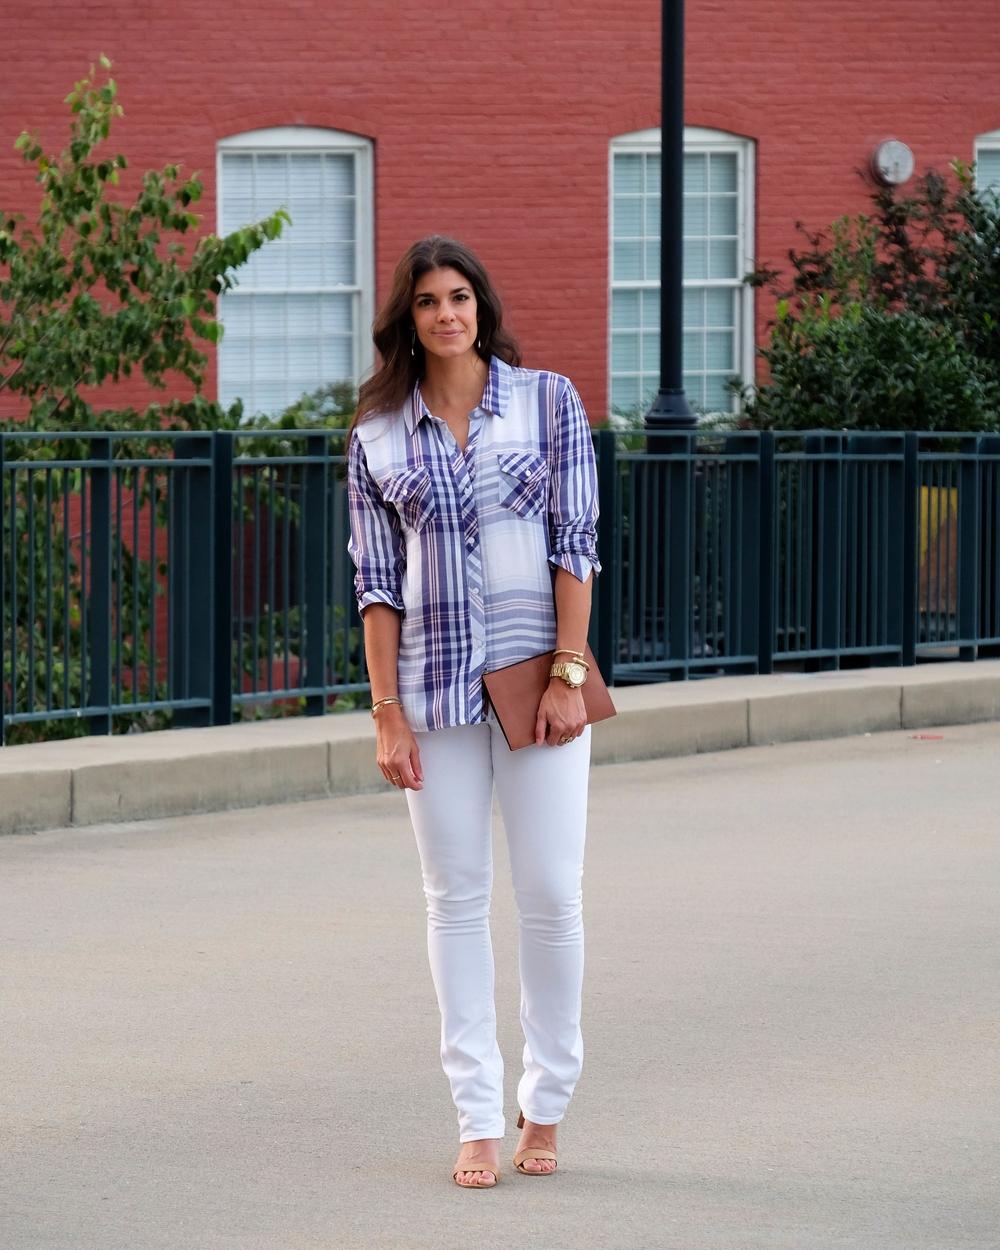 LaurenSchwaiger-Life-Style-Blog-OOTD-Rails-Summer-Plaid-White-Blue.jpg